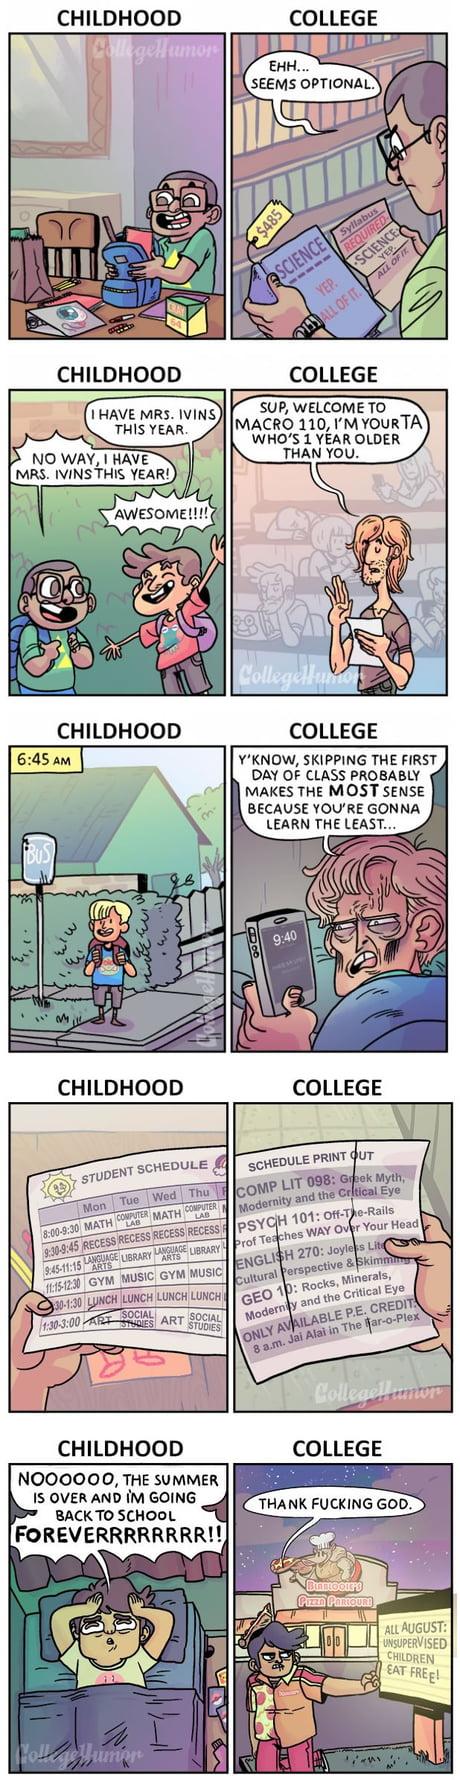 Back To School: Childhood vs. College